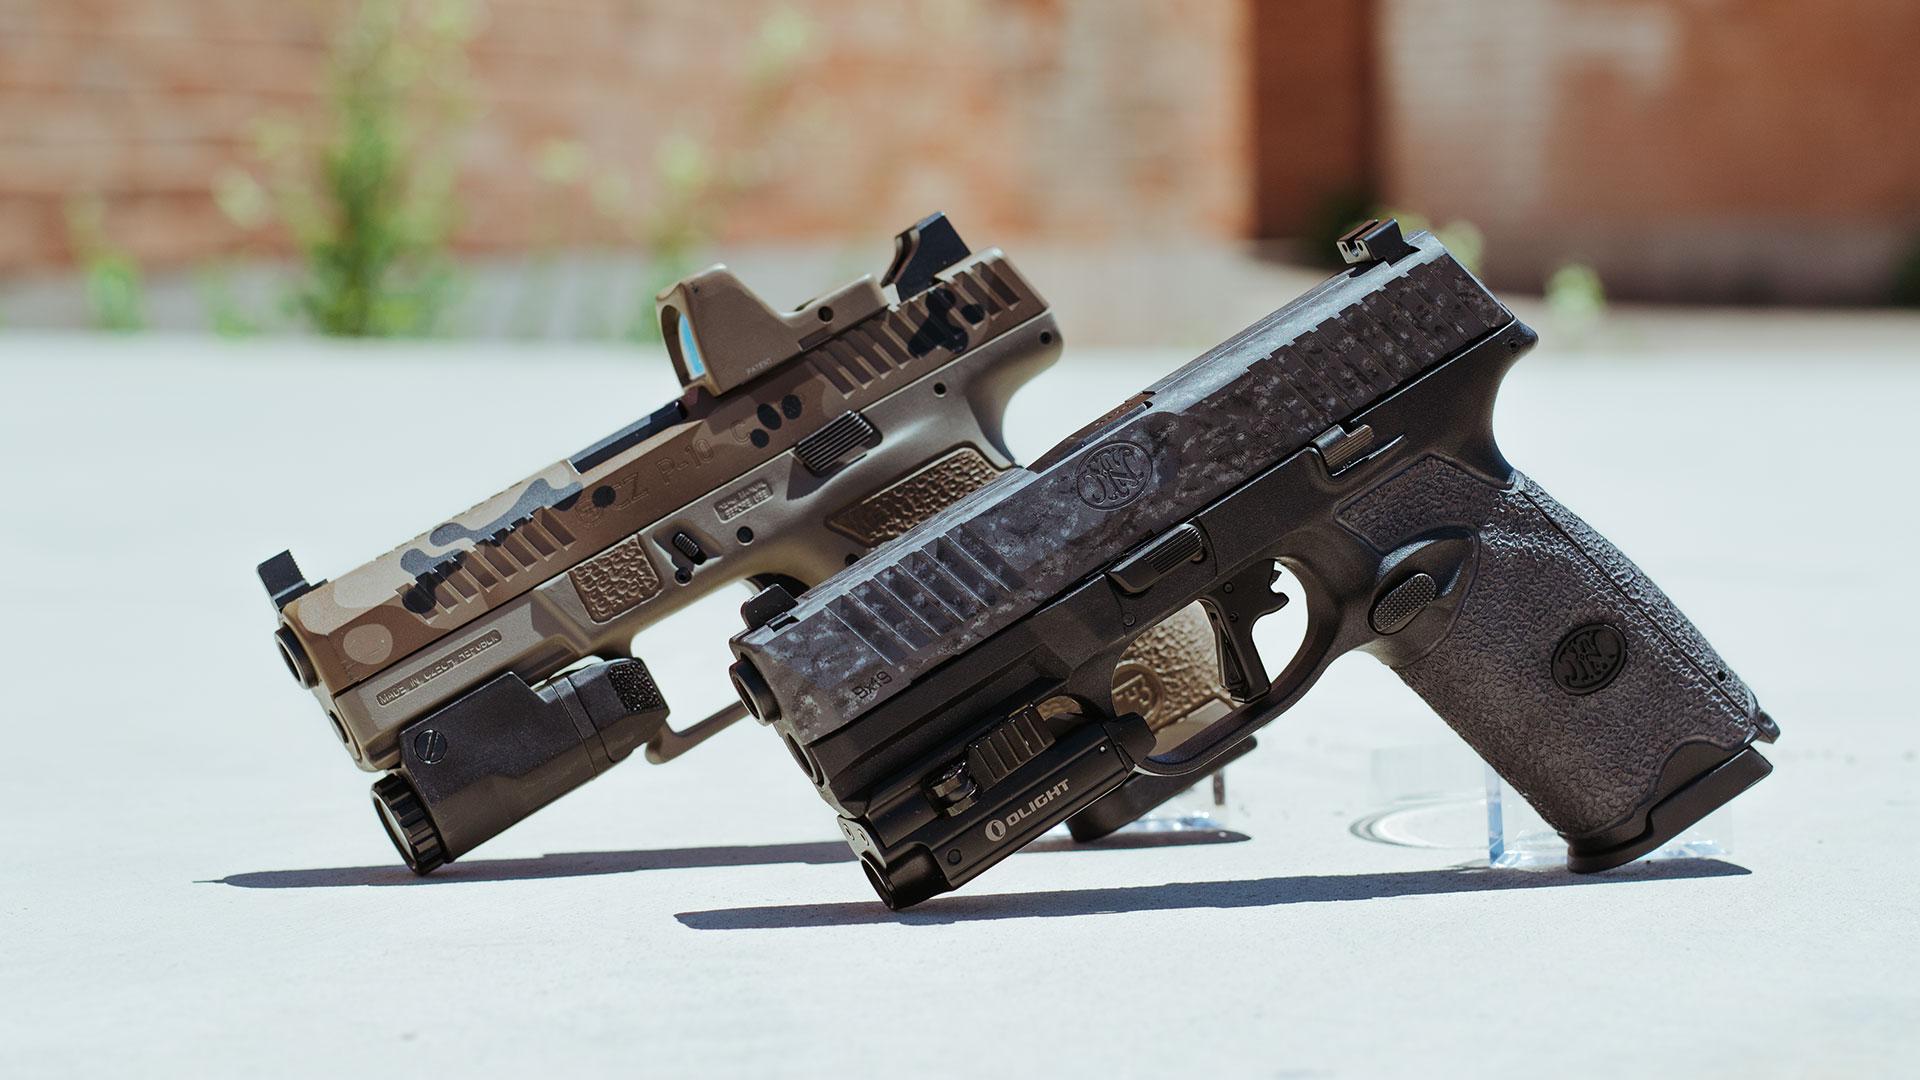 Two tactical guns